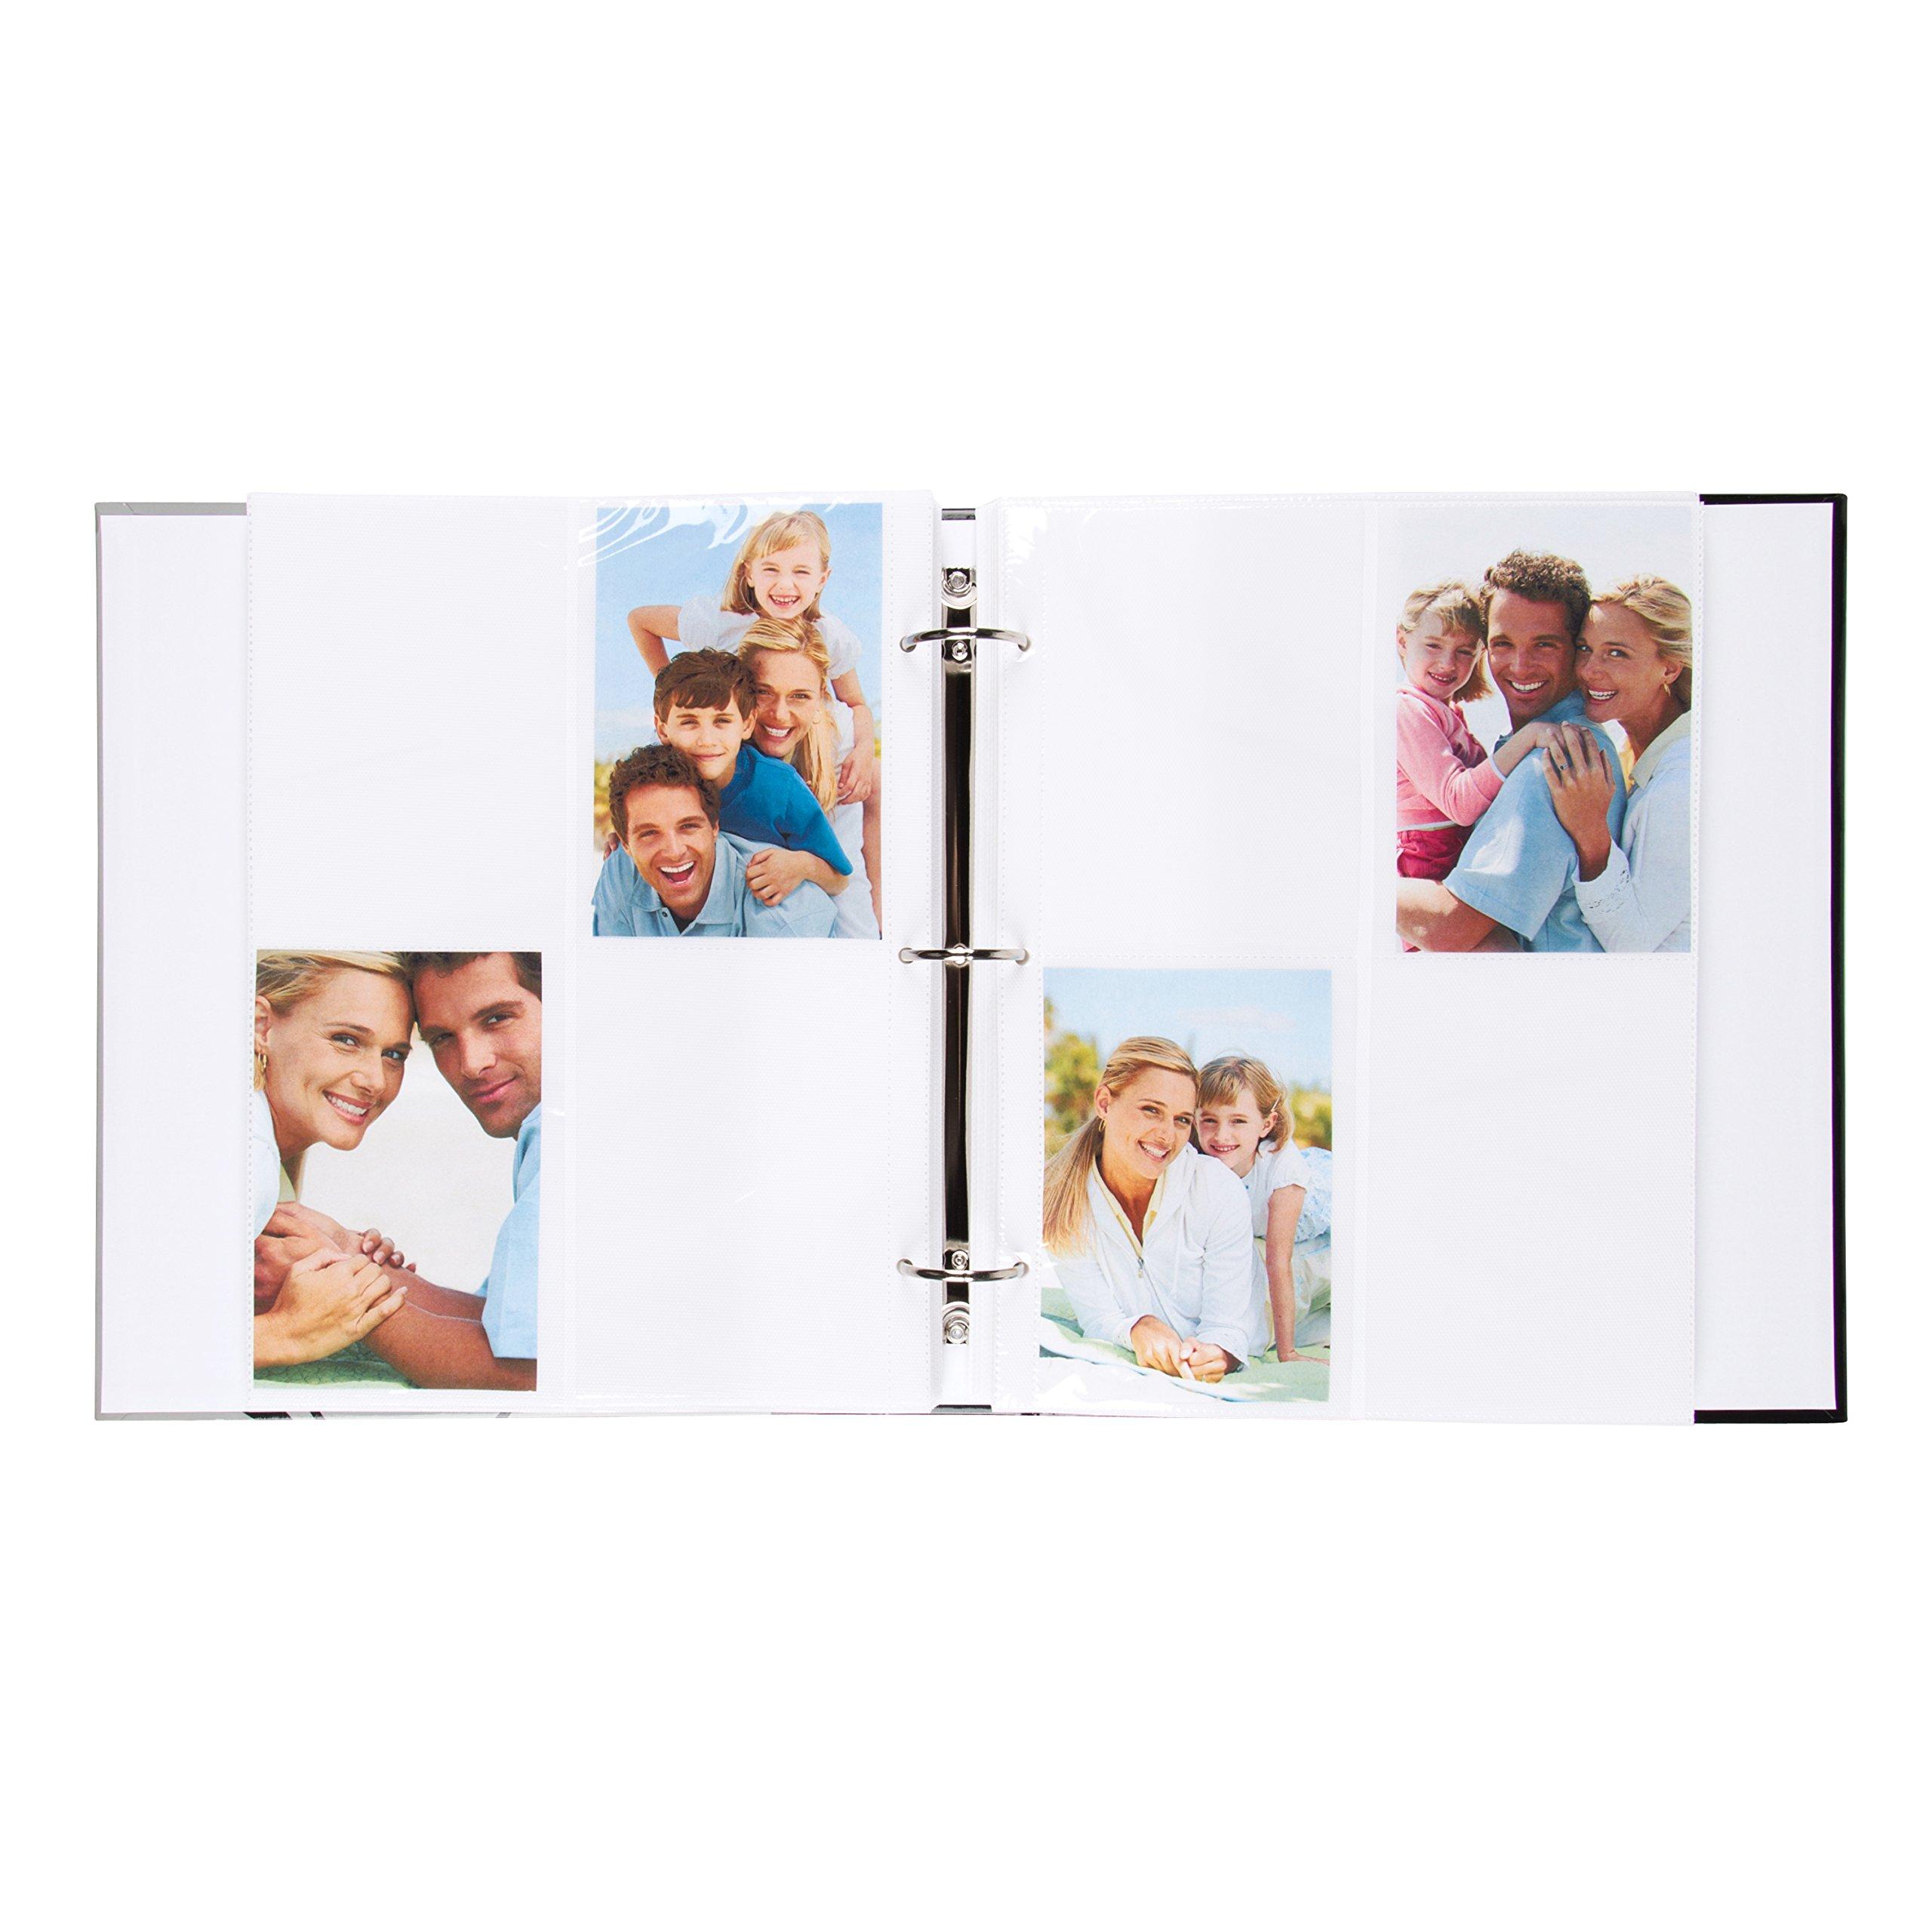 DesignOvation Live Laugh Love Expression Photo Album, Holds 440 4x6 Photos, Set of 4 by DesignOvation (Image #4)